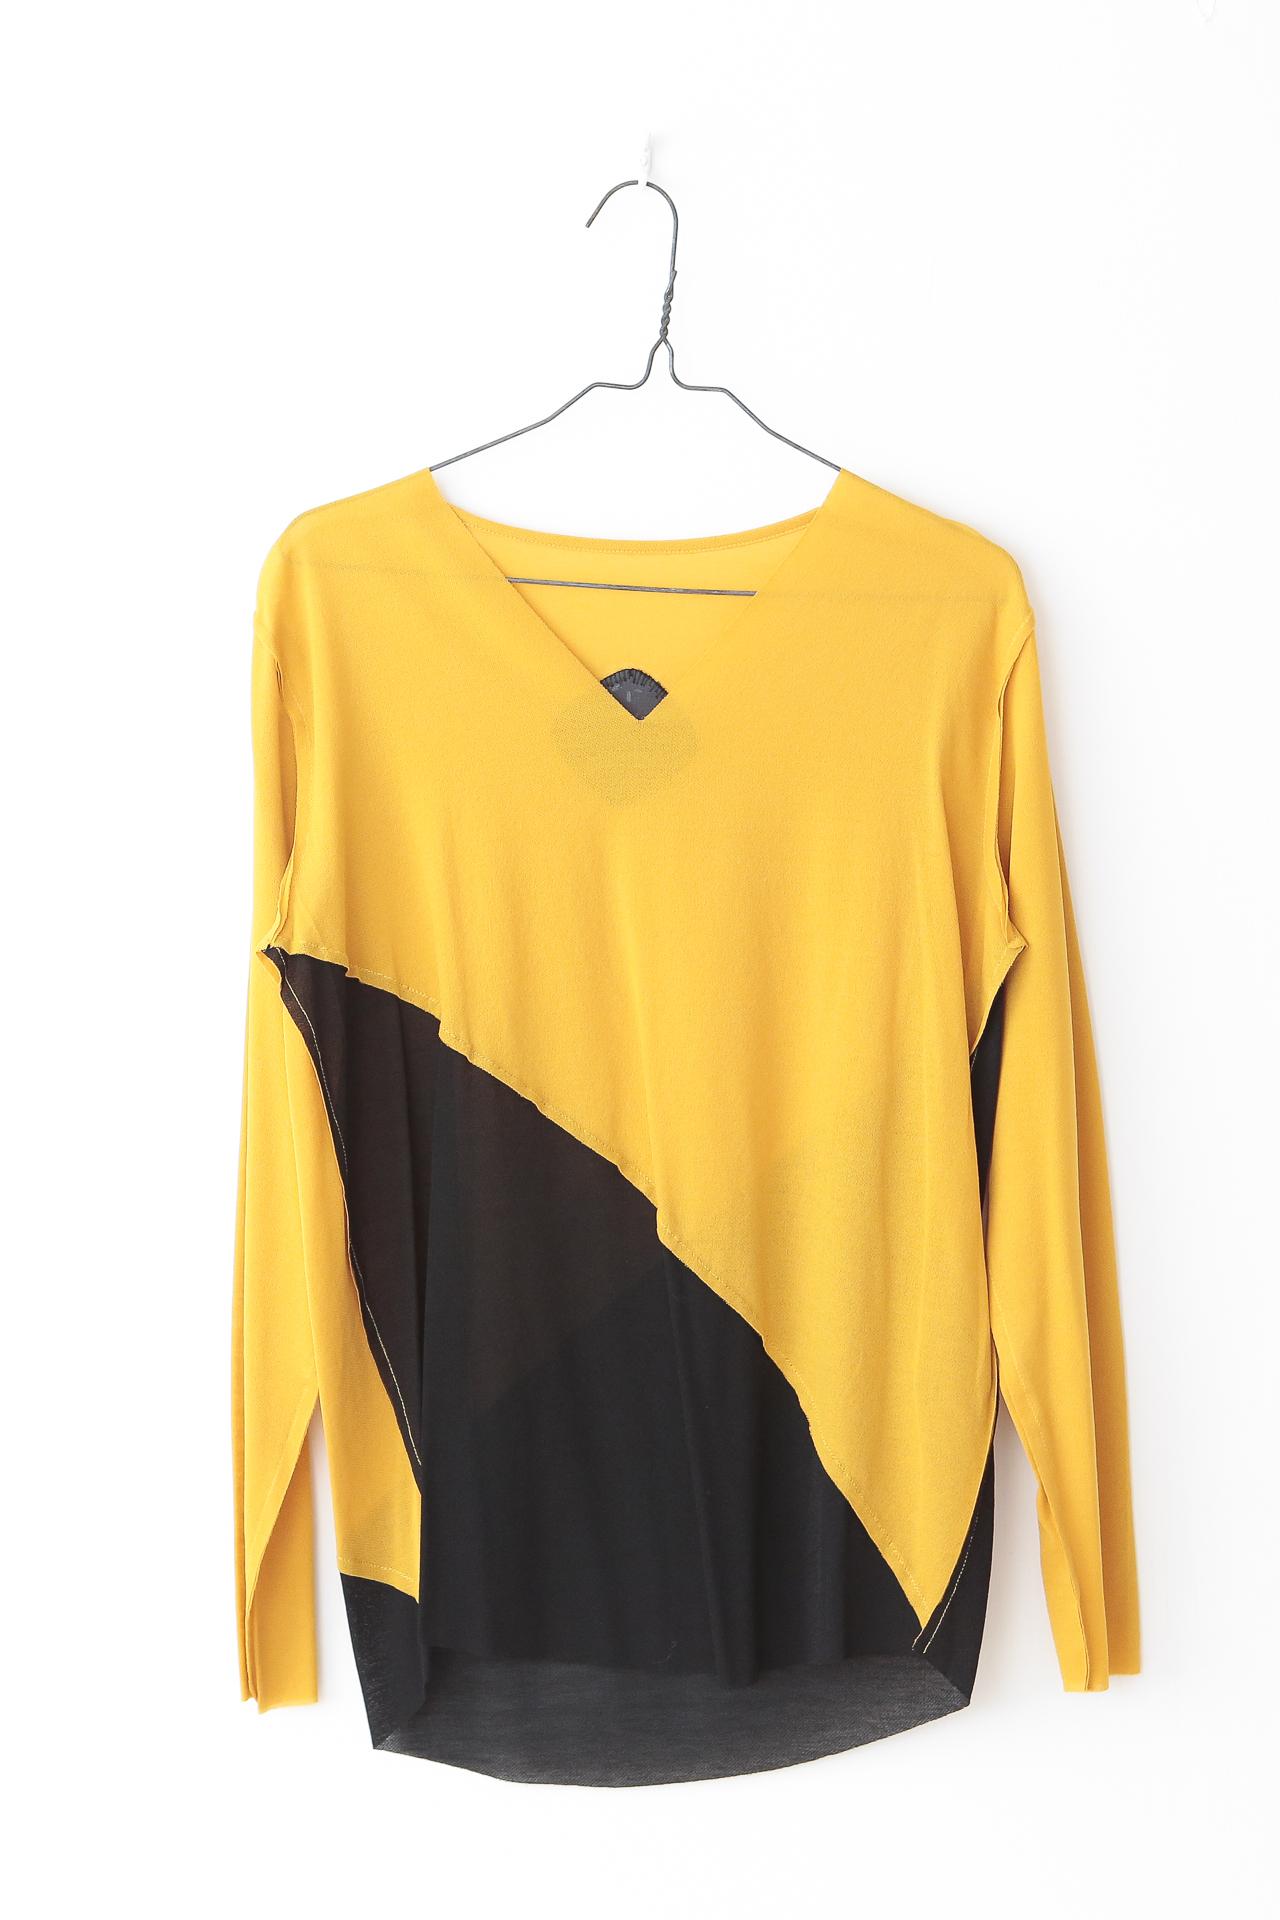 T-shirt【COTTON コットン】CS2110[税/送料込み][受注生産]